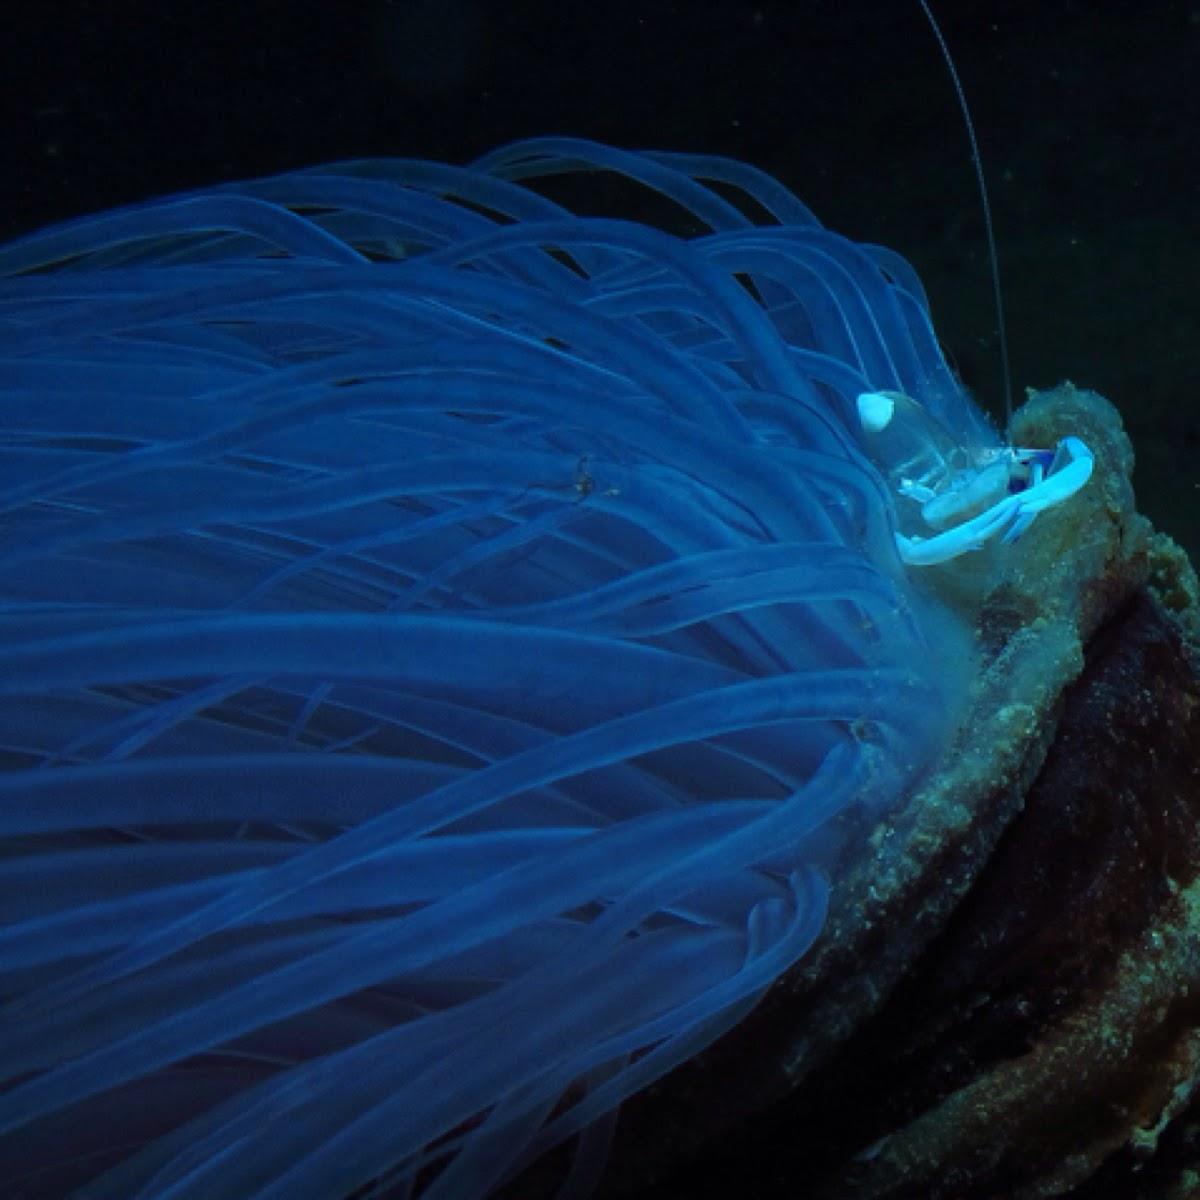 Magnificent shrimp